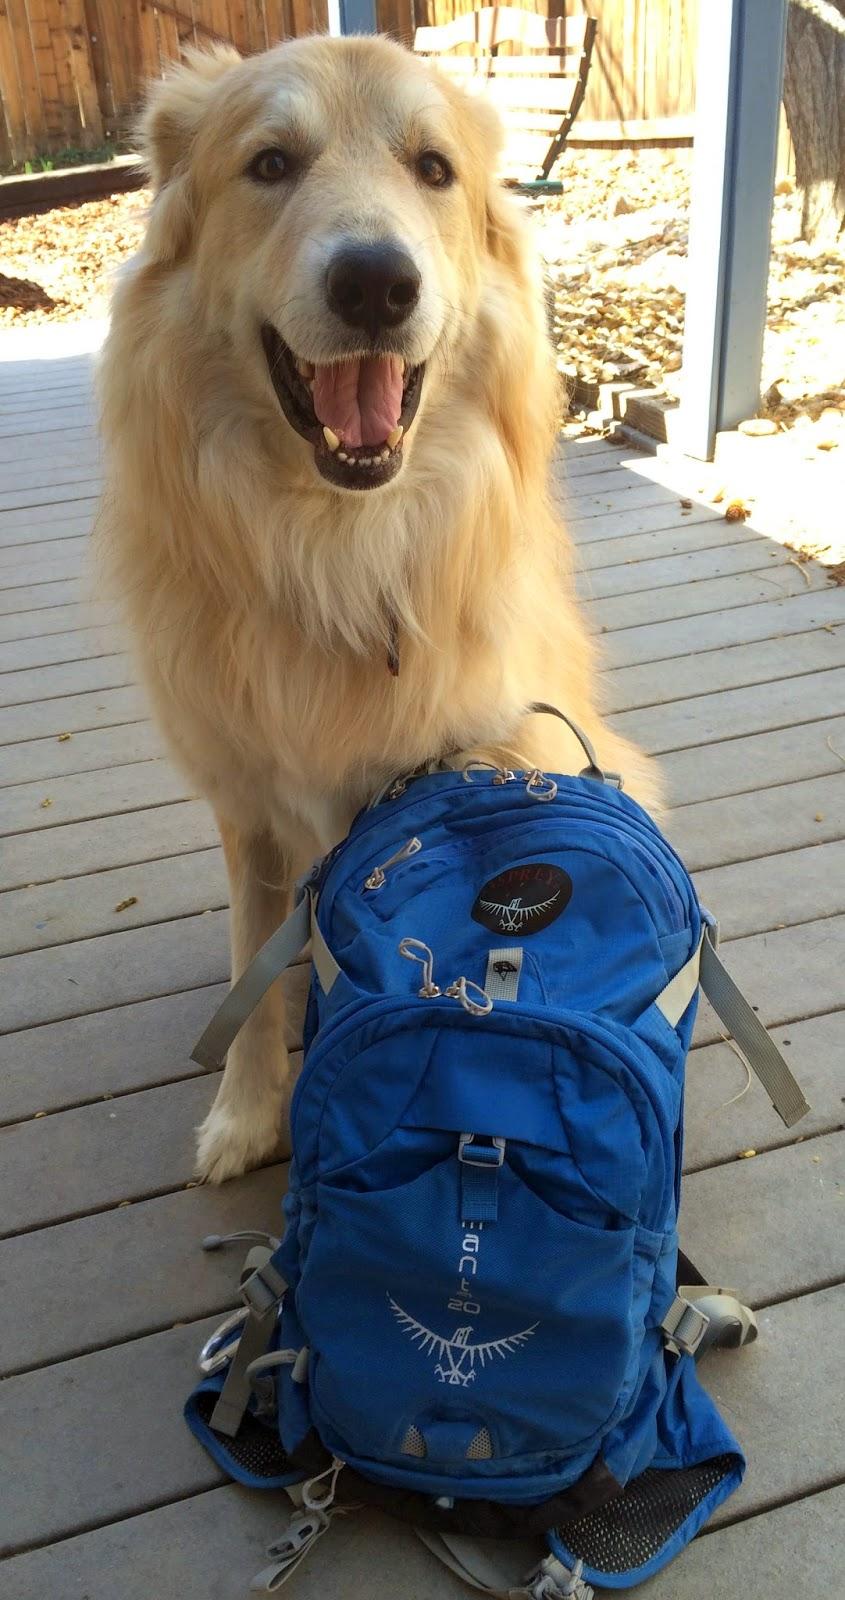 Osprey Manta 20 Hydration Pack and Dog